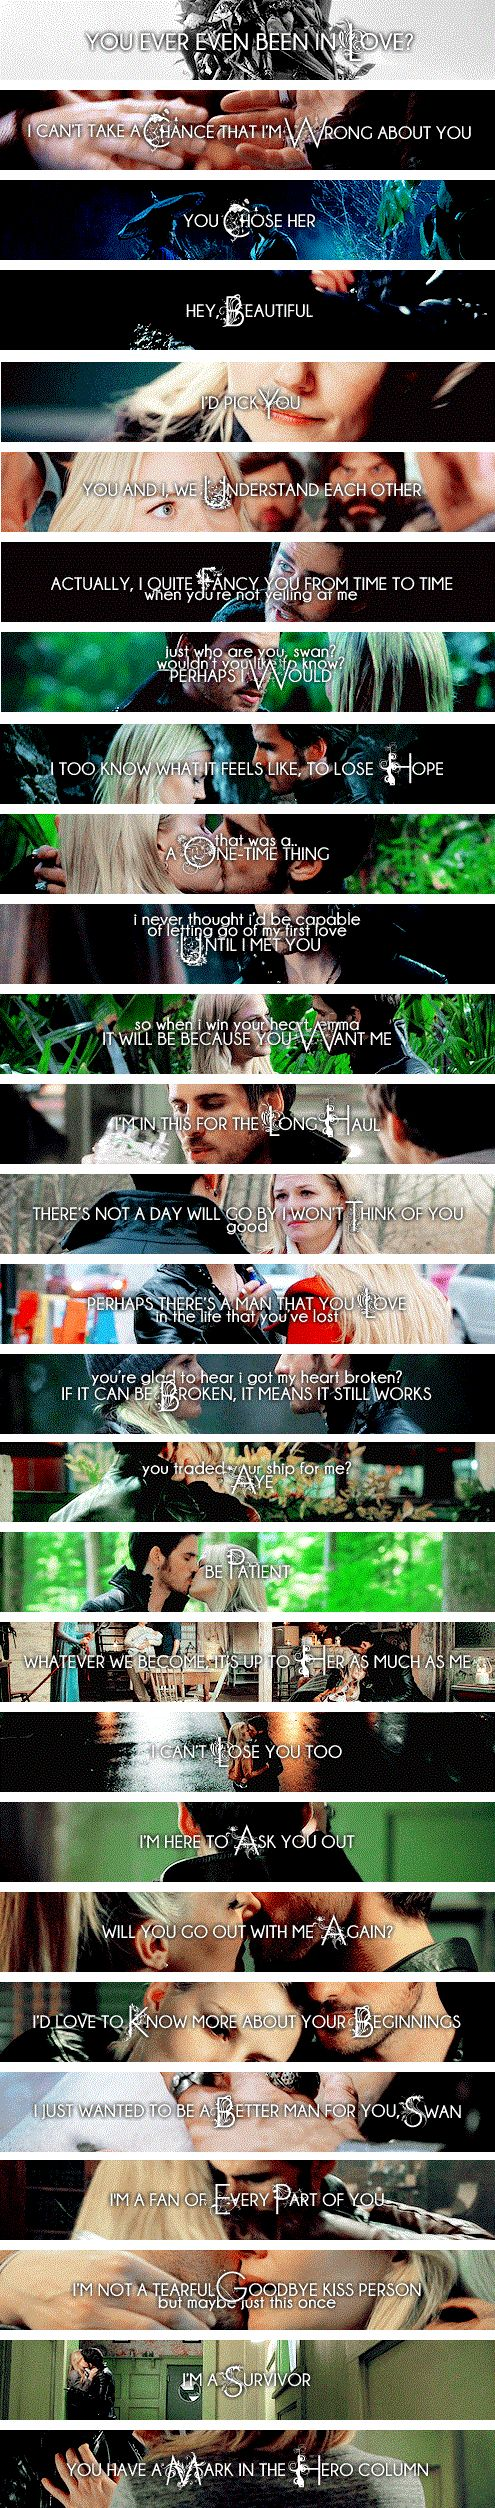 Colin O'Donoghue / Killian Jones / Capitan Hook Jennifer Morrison / Emma Swan/ Once Upon A Time - C'era Una volta If you take place like thanks Miriam